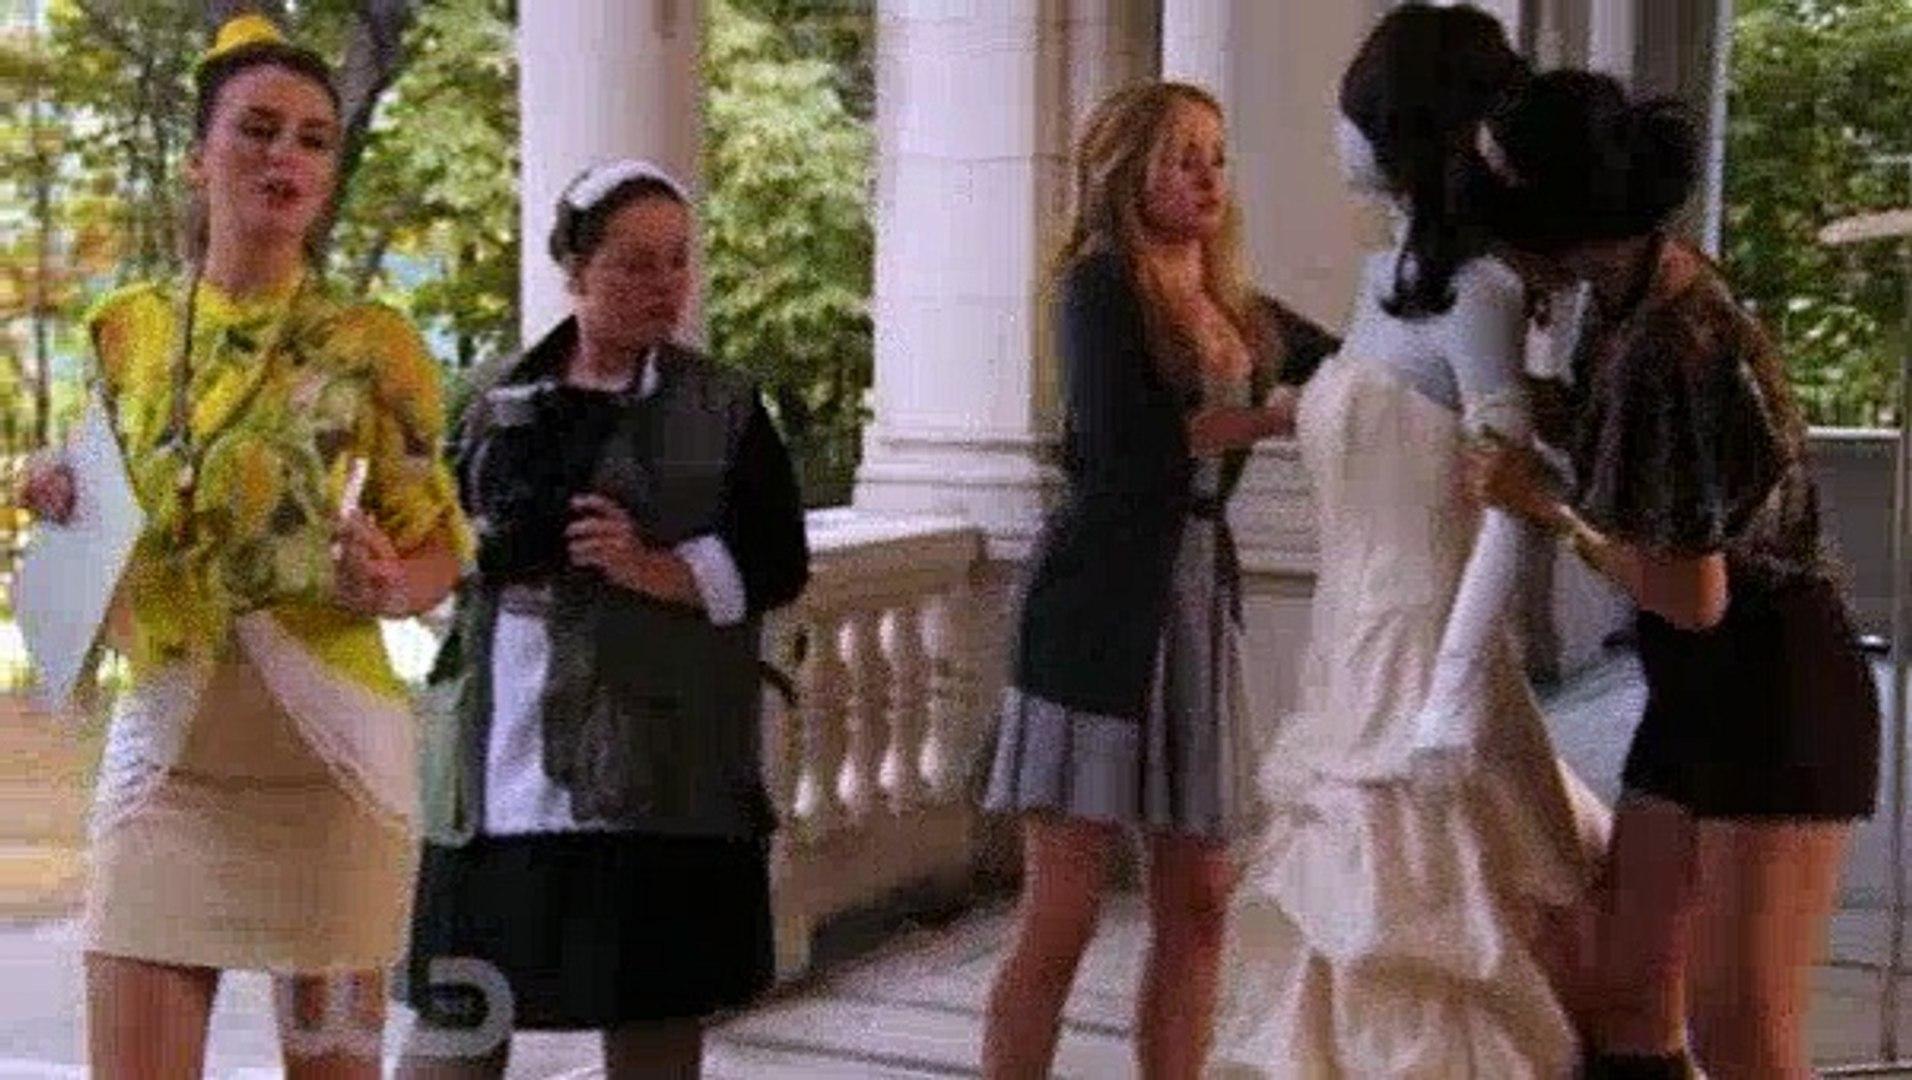 Gossip girl season 5 episode 6 dailymotion